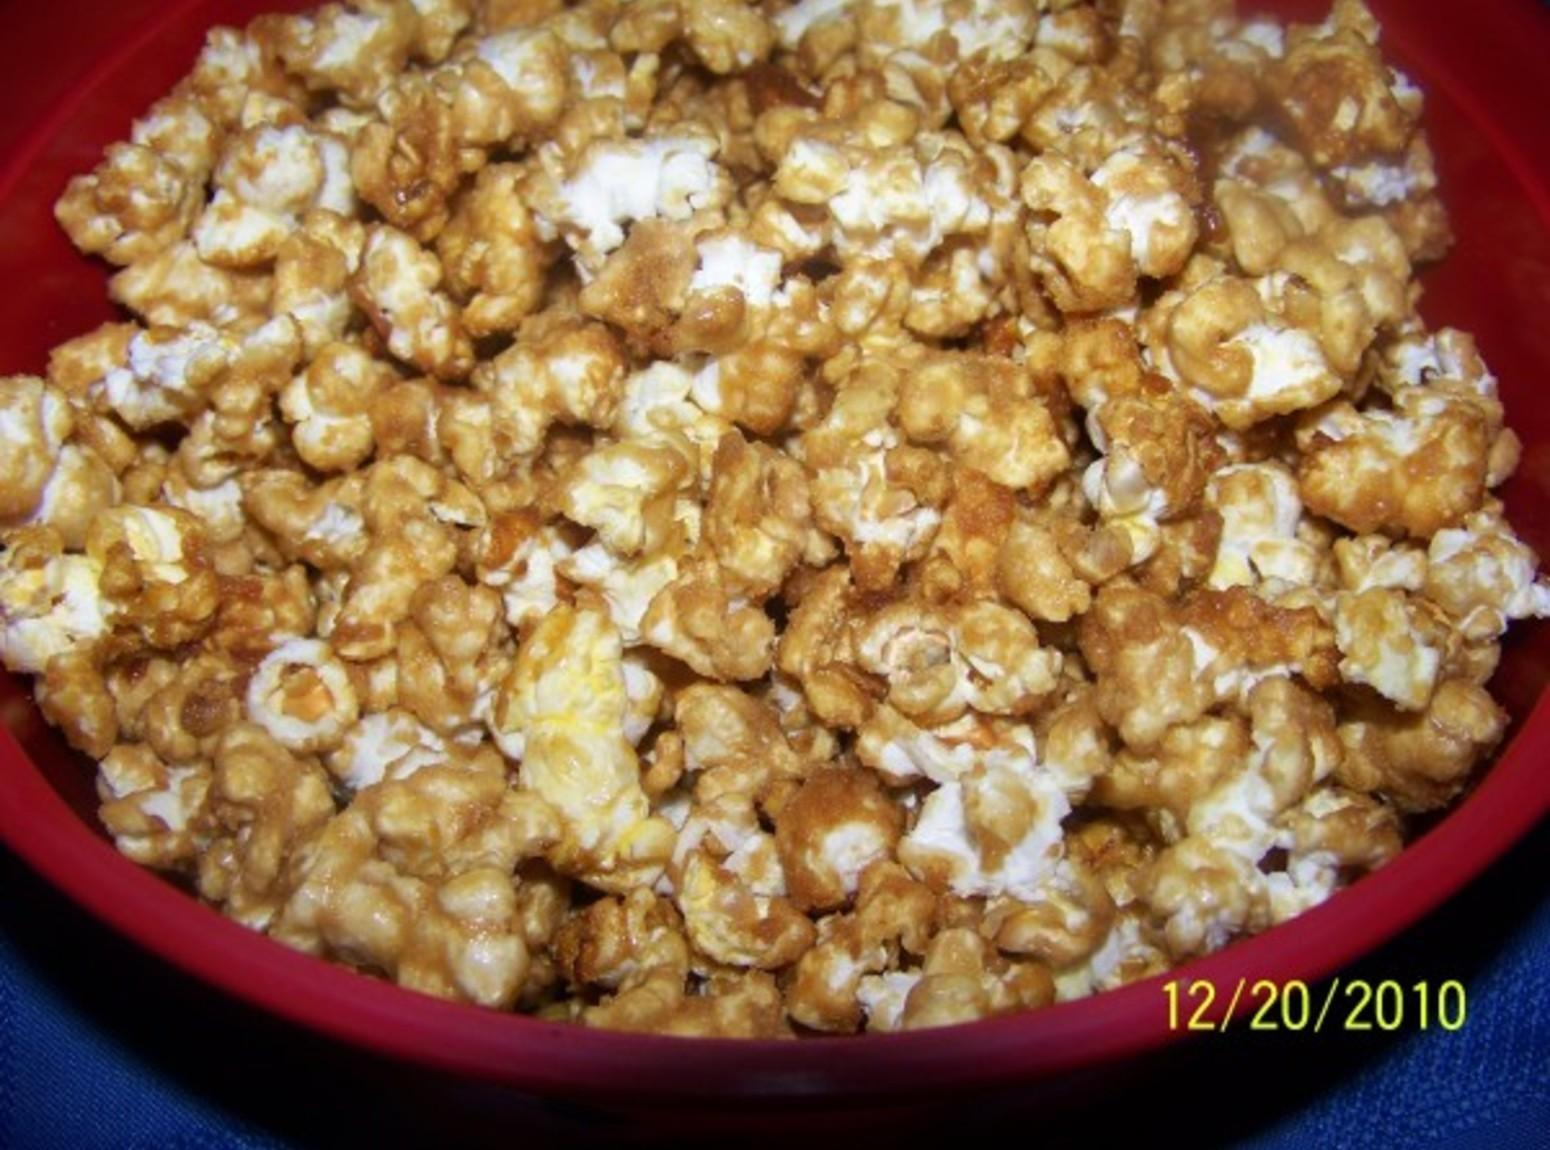 Crunchy Caramel Popcorn Recipe